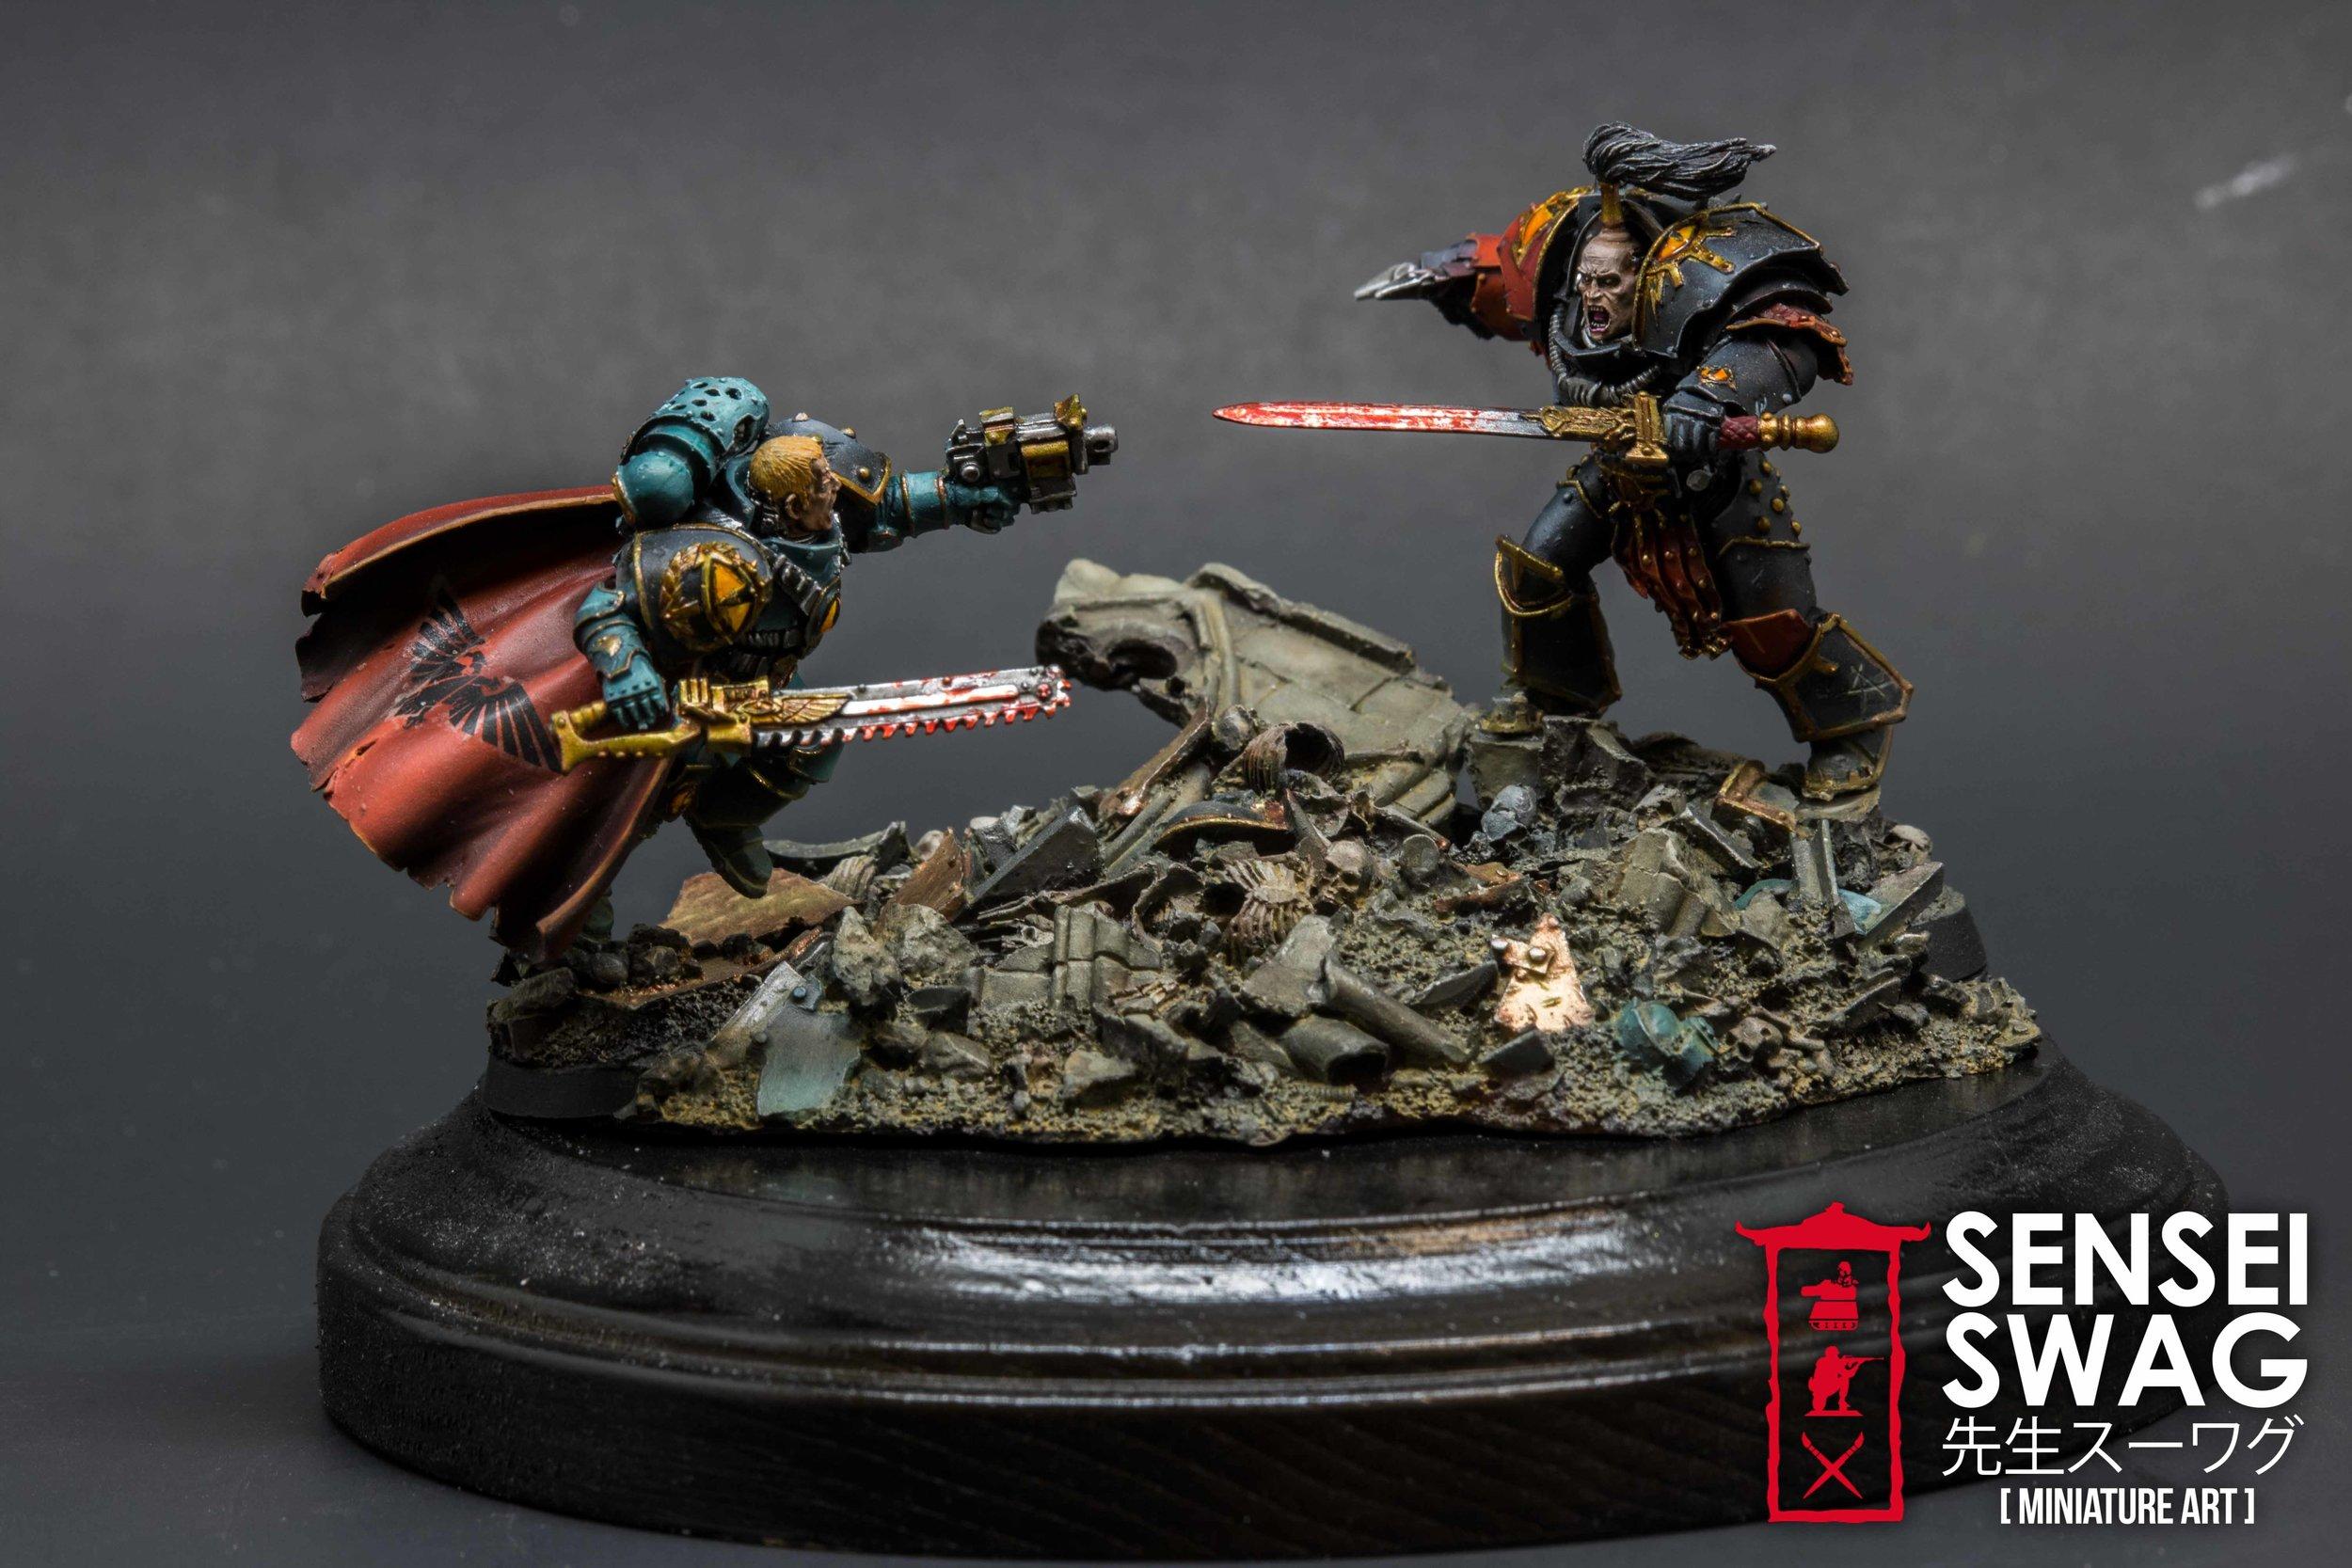 Abaddon vs Loken 30k Forgeworld Horus Heresy 40k Warhammer diorama Character Series (3 of 4).jpg